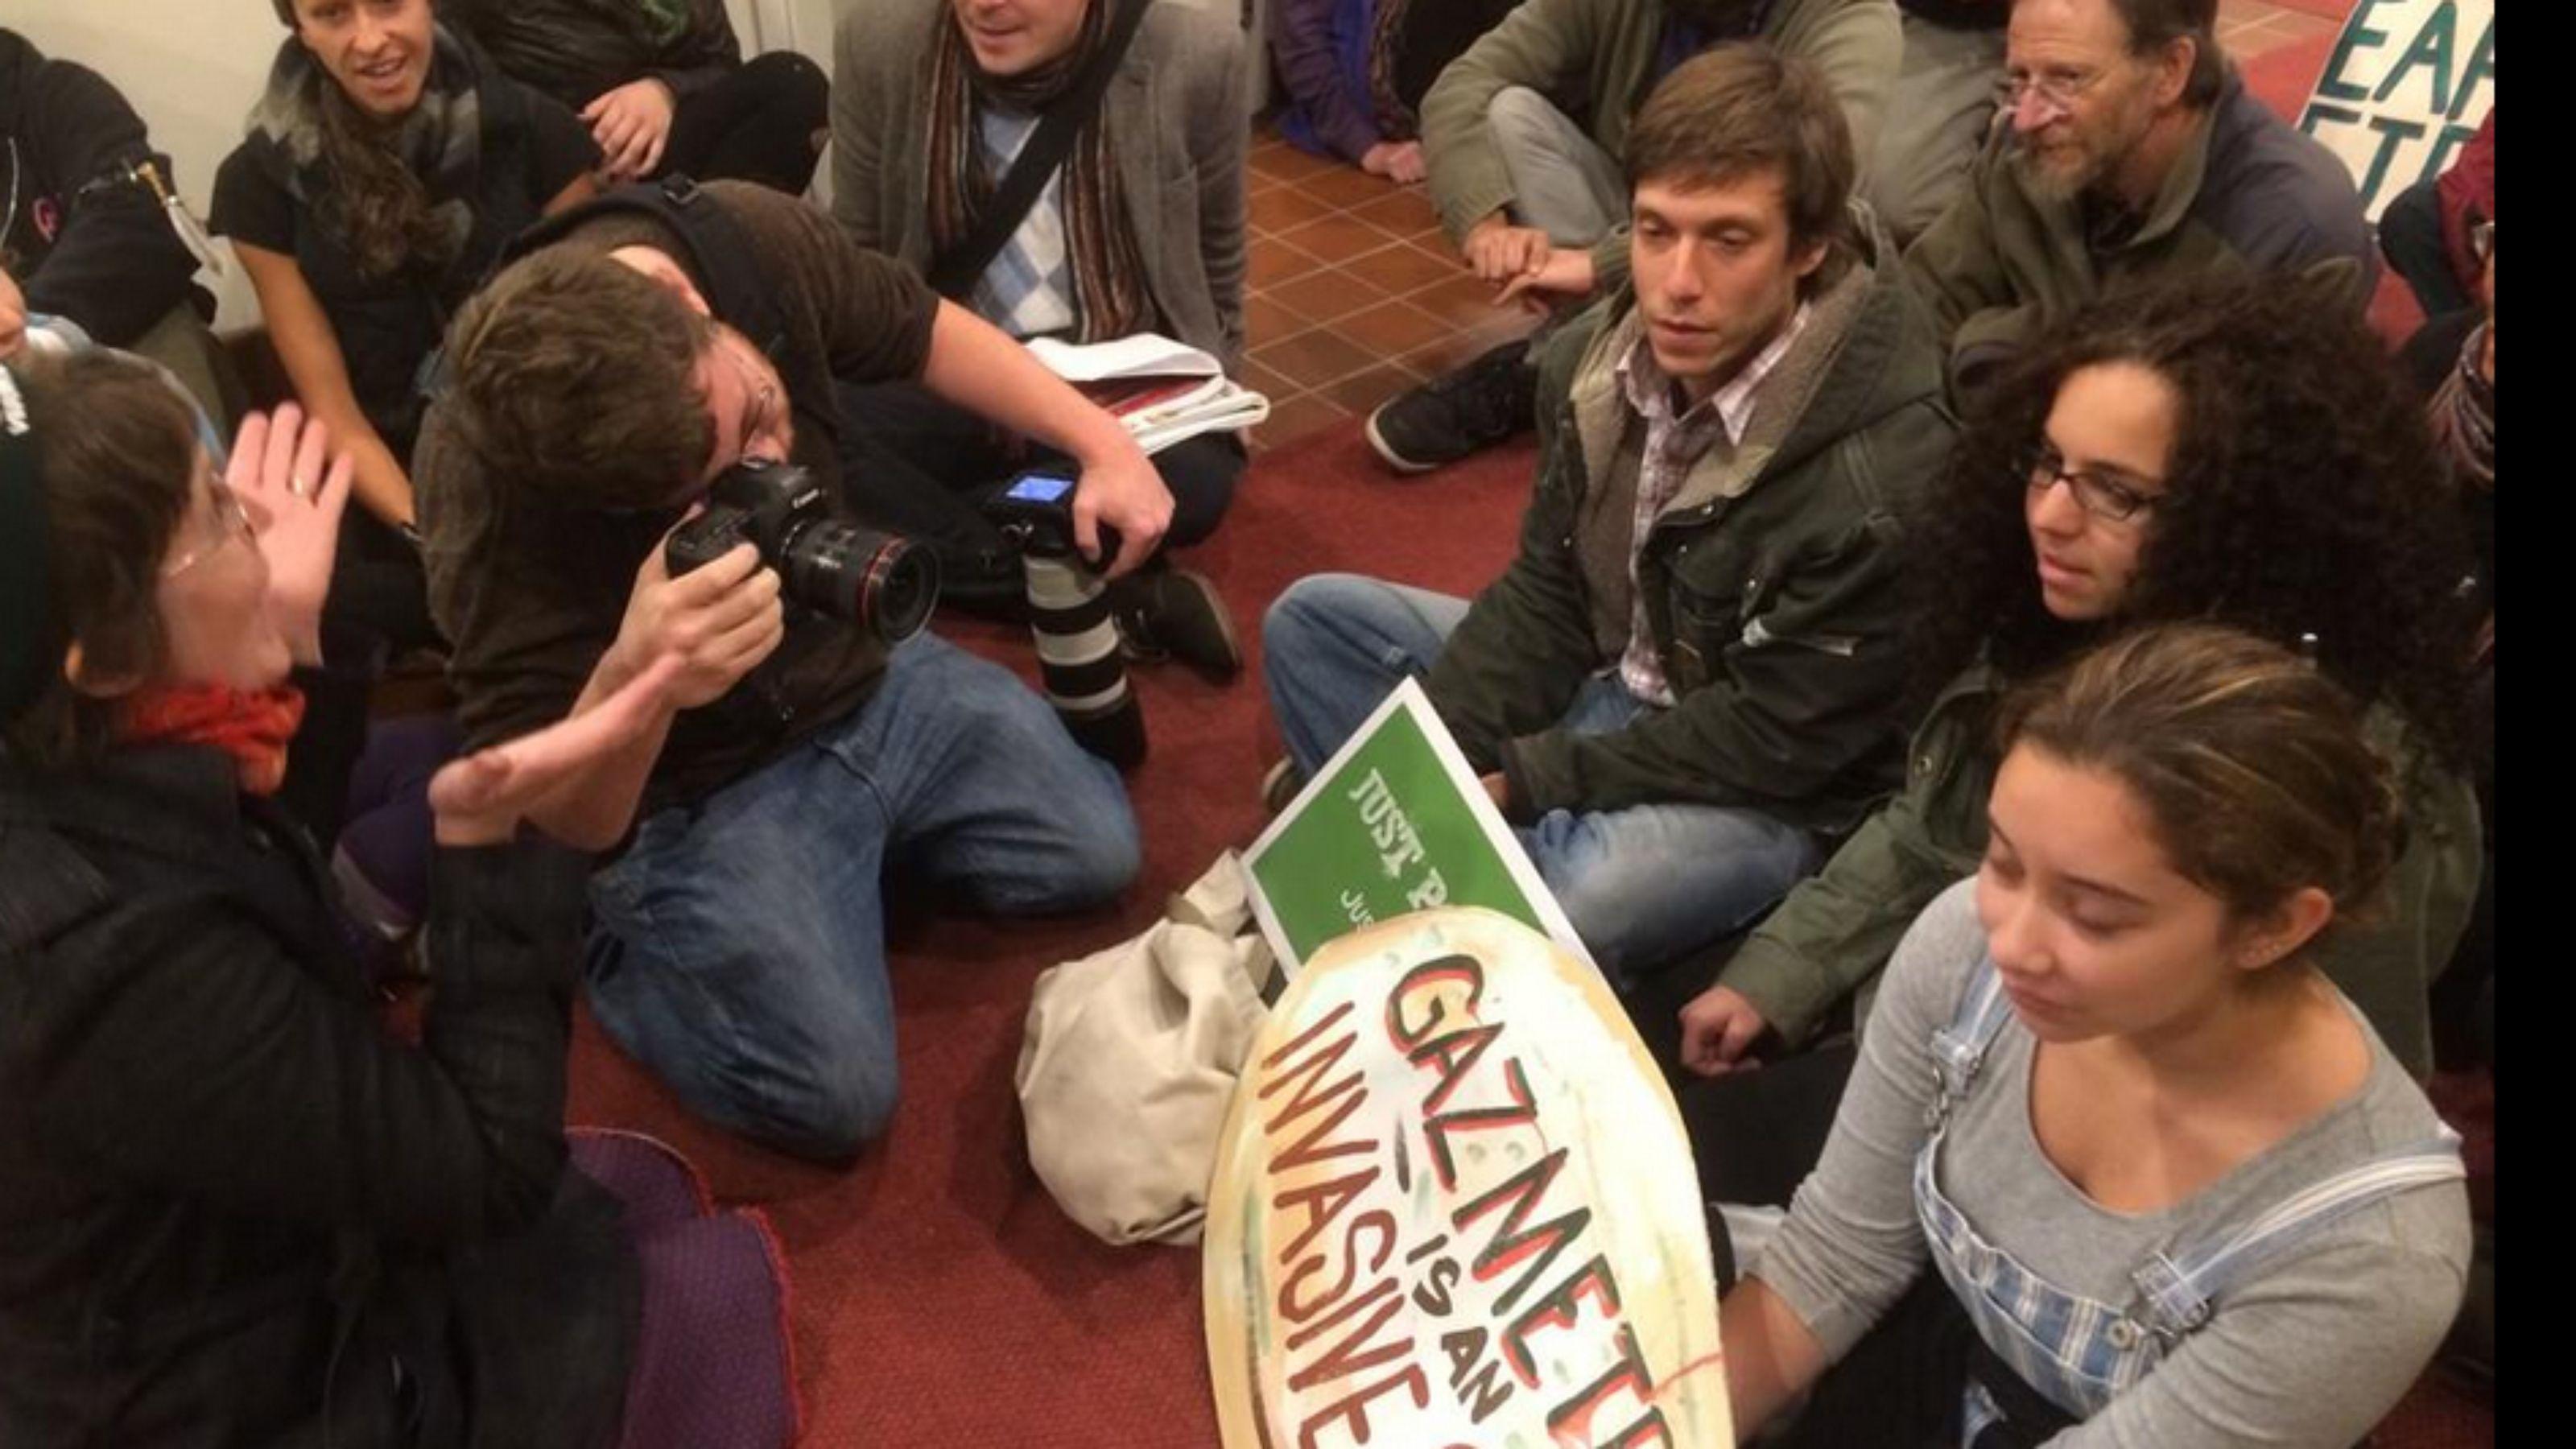 VermontProtesters.jpg